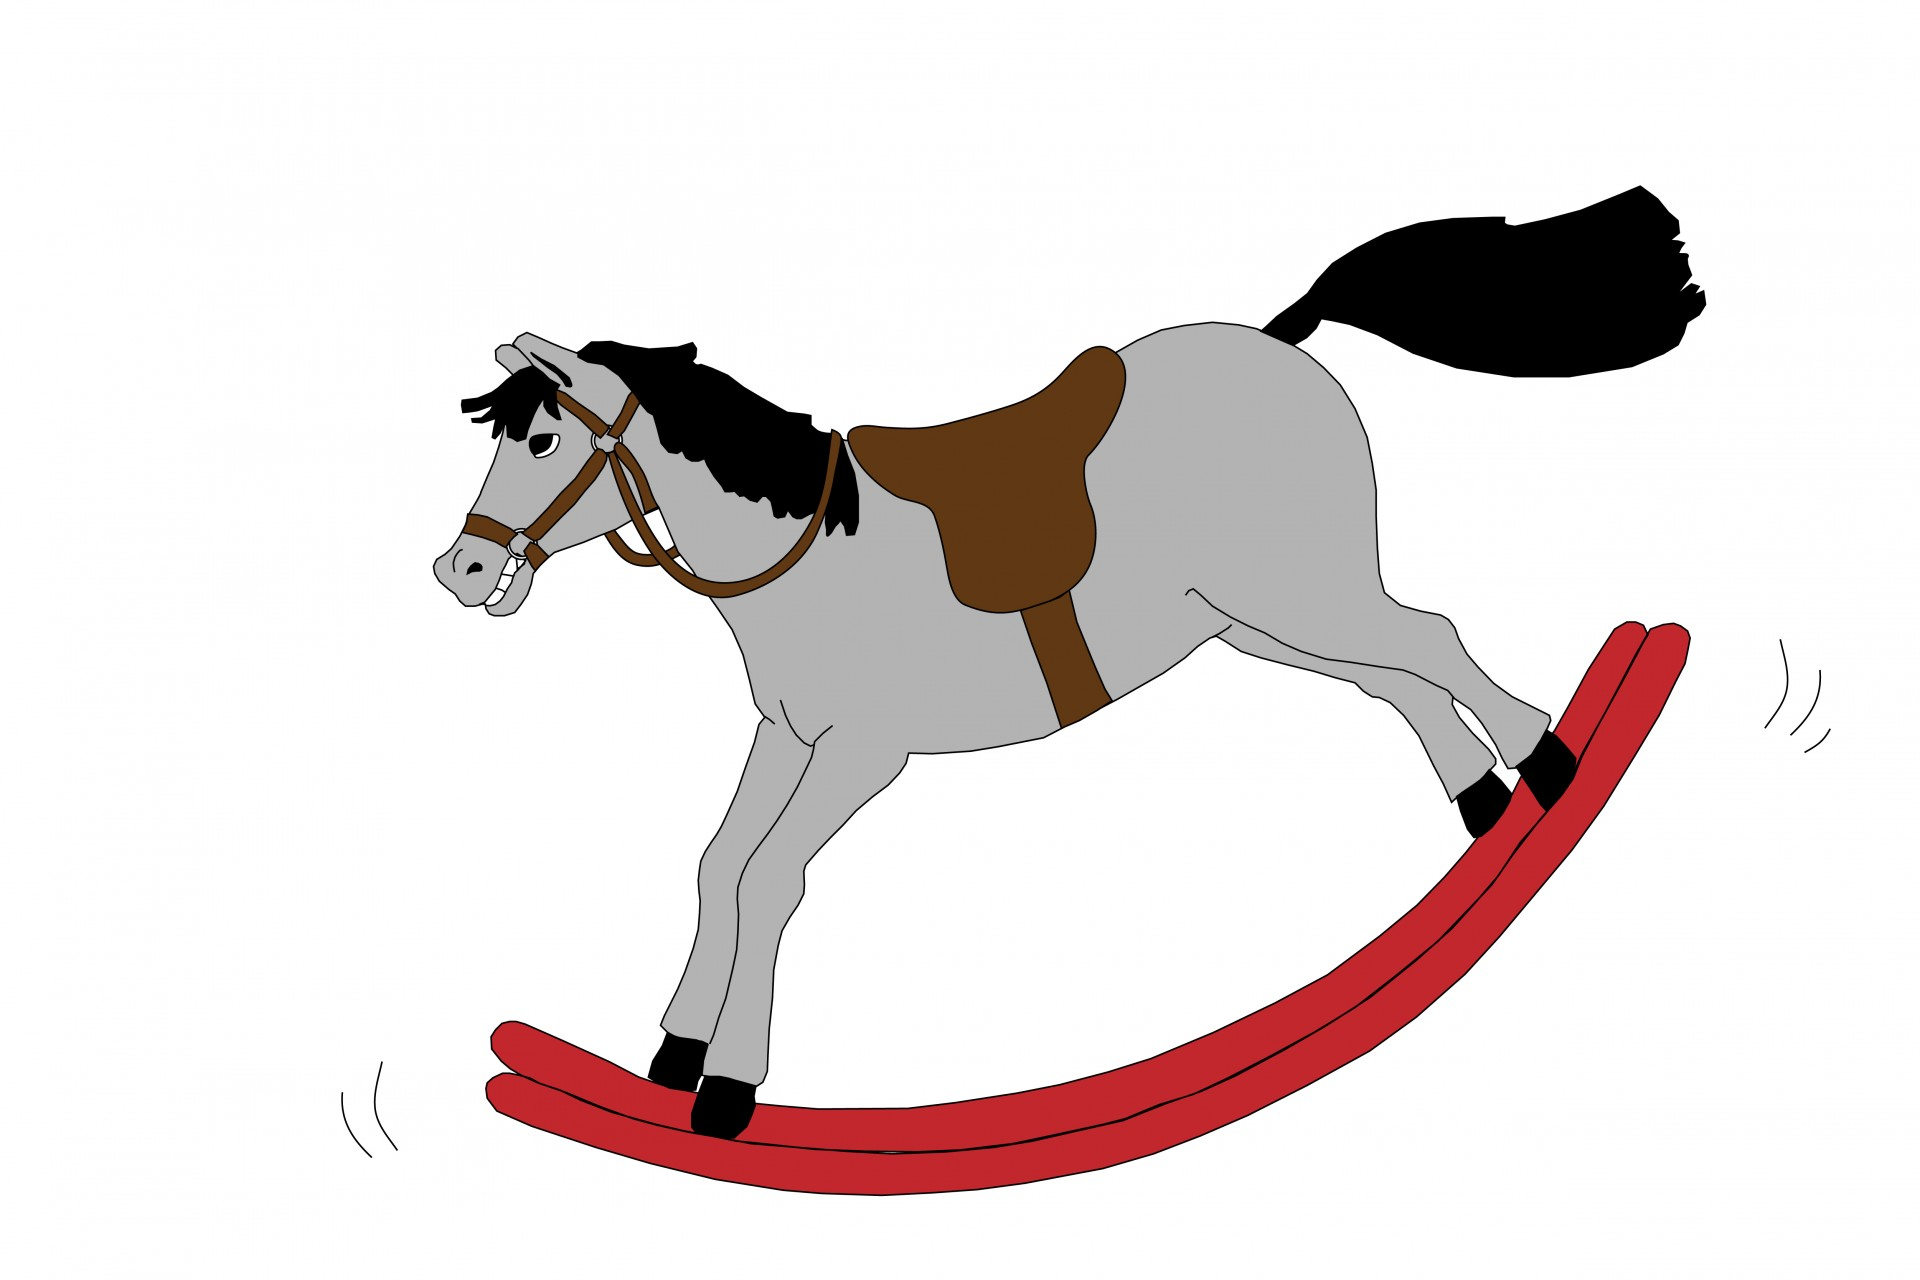 1920x1280 Rocking Horse Clipart Free Stock Photo